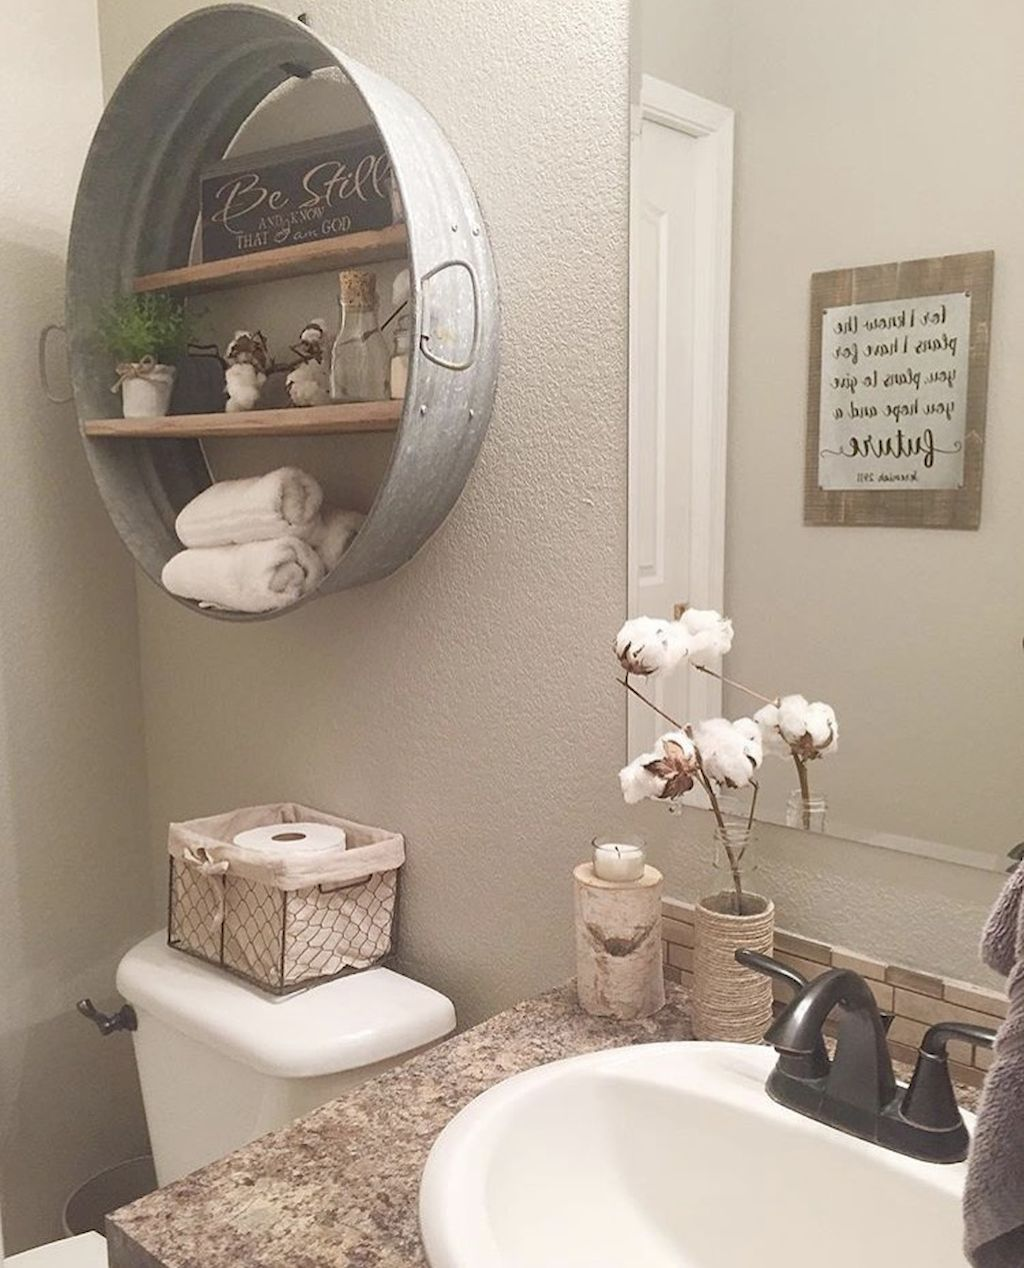 Adorable 60 Vintage Farmhouse Bathroom Remodel Ideas On A Budget Https Homevialand Rustic Decor Diy Home